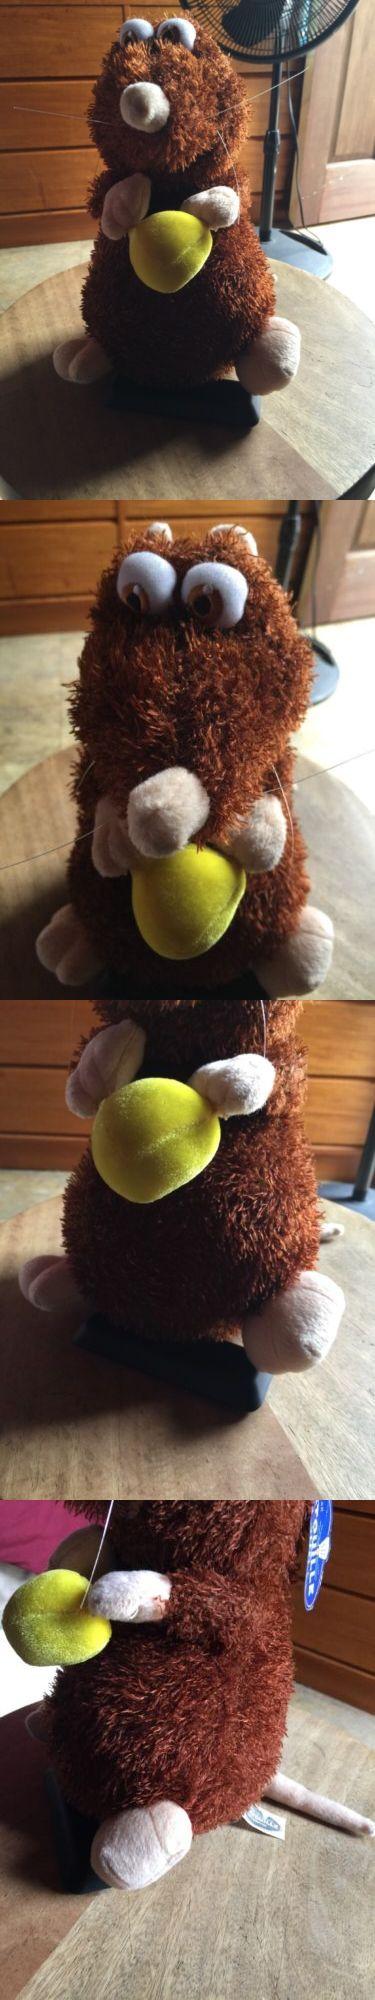 Ratatouille 158767: Disney Store Pixar Emile (Remy S Brother)Ratatouille Rat Cheese Plush Toy 8 Nwt -> BUY IT NOW ONLY: $32 on eBay!